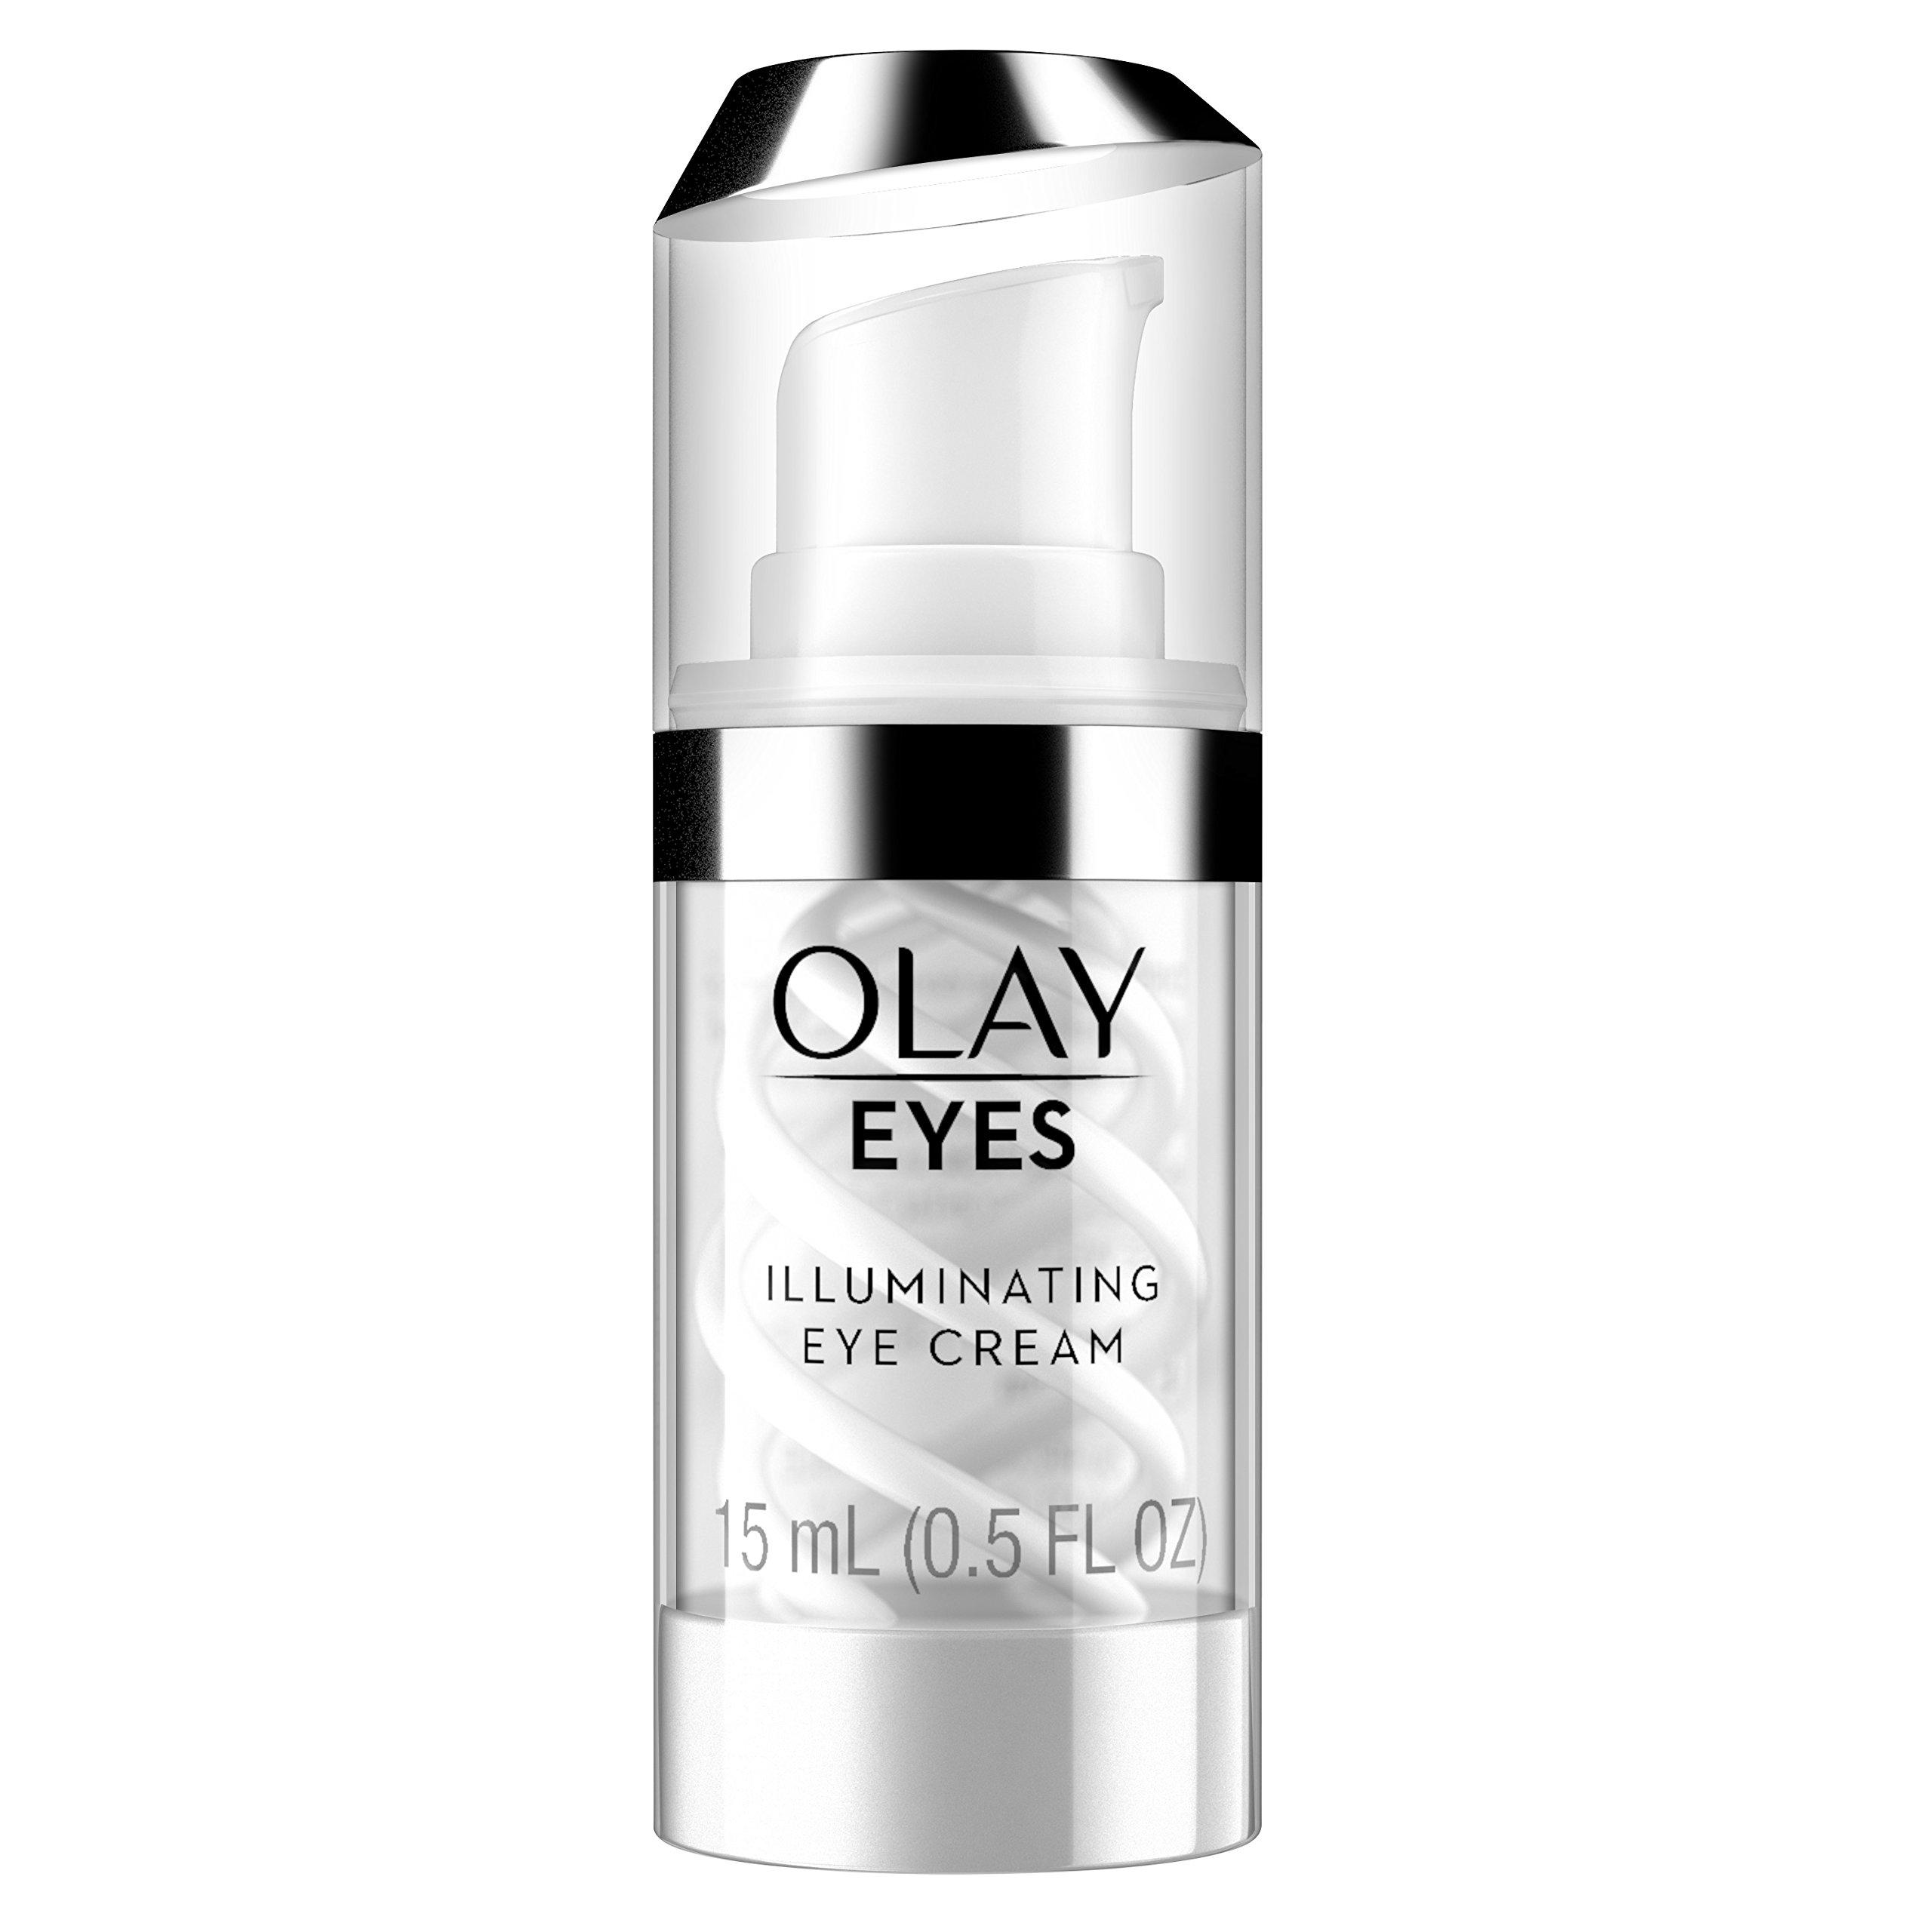 Eye Cream by Olay Eyes Illuminating to Help Reduce the look of Dark Circles Under Eyes, 0.5 Fl Oz Packaging may Vary